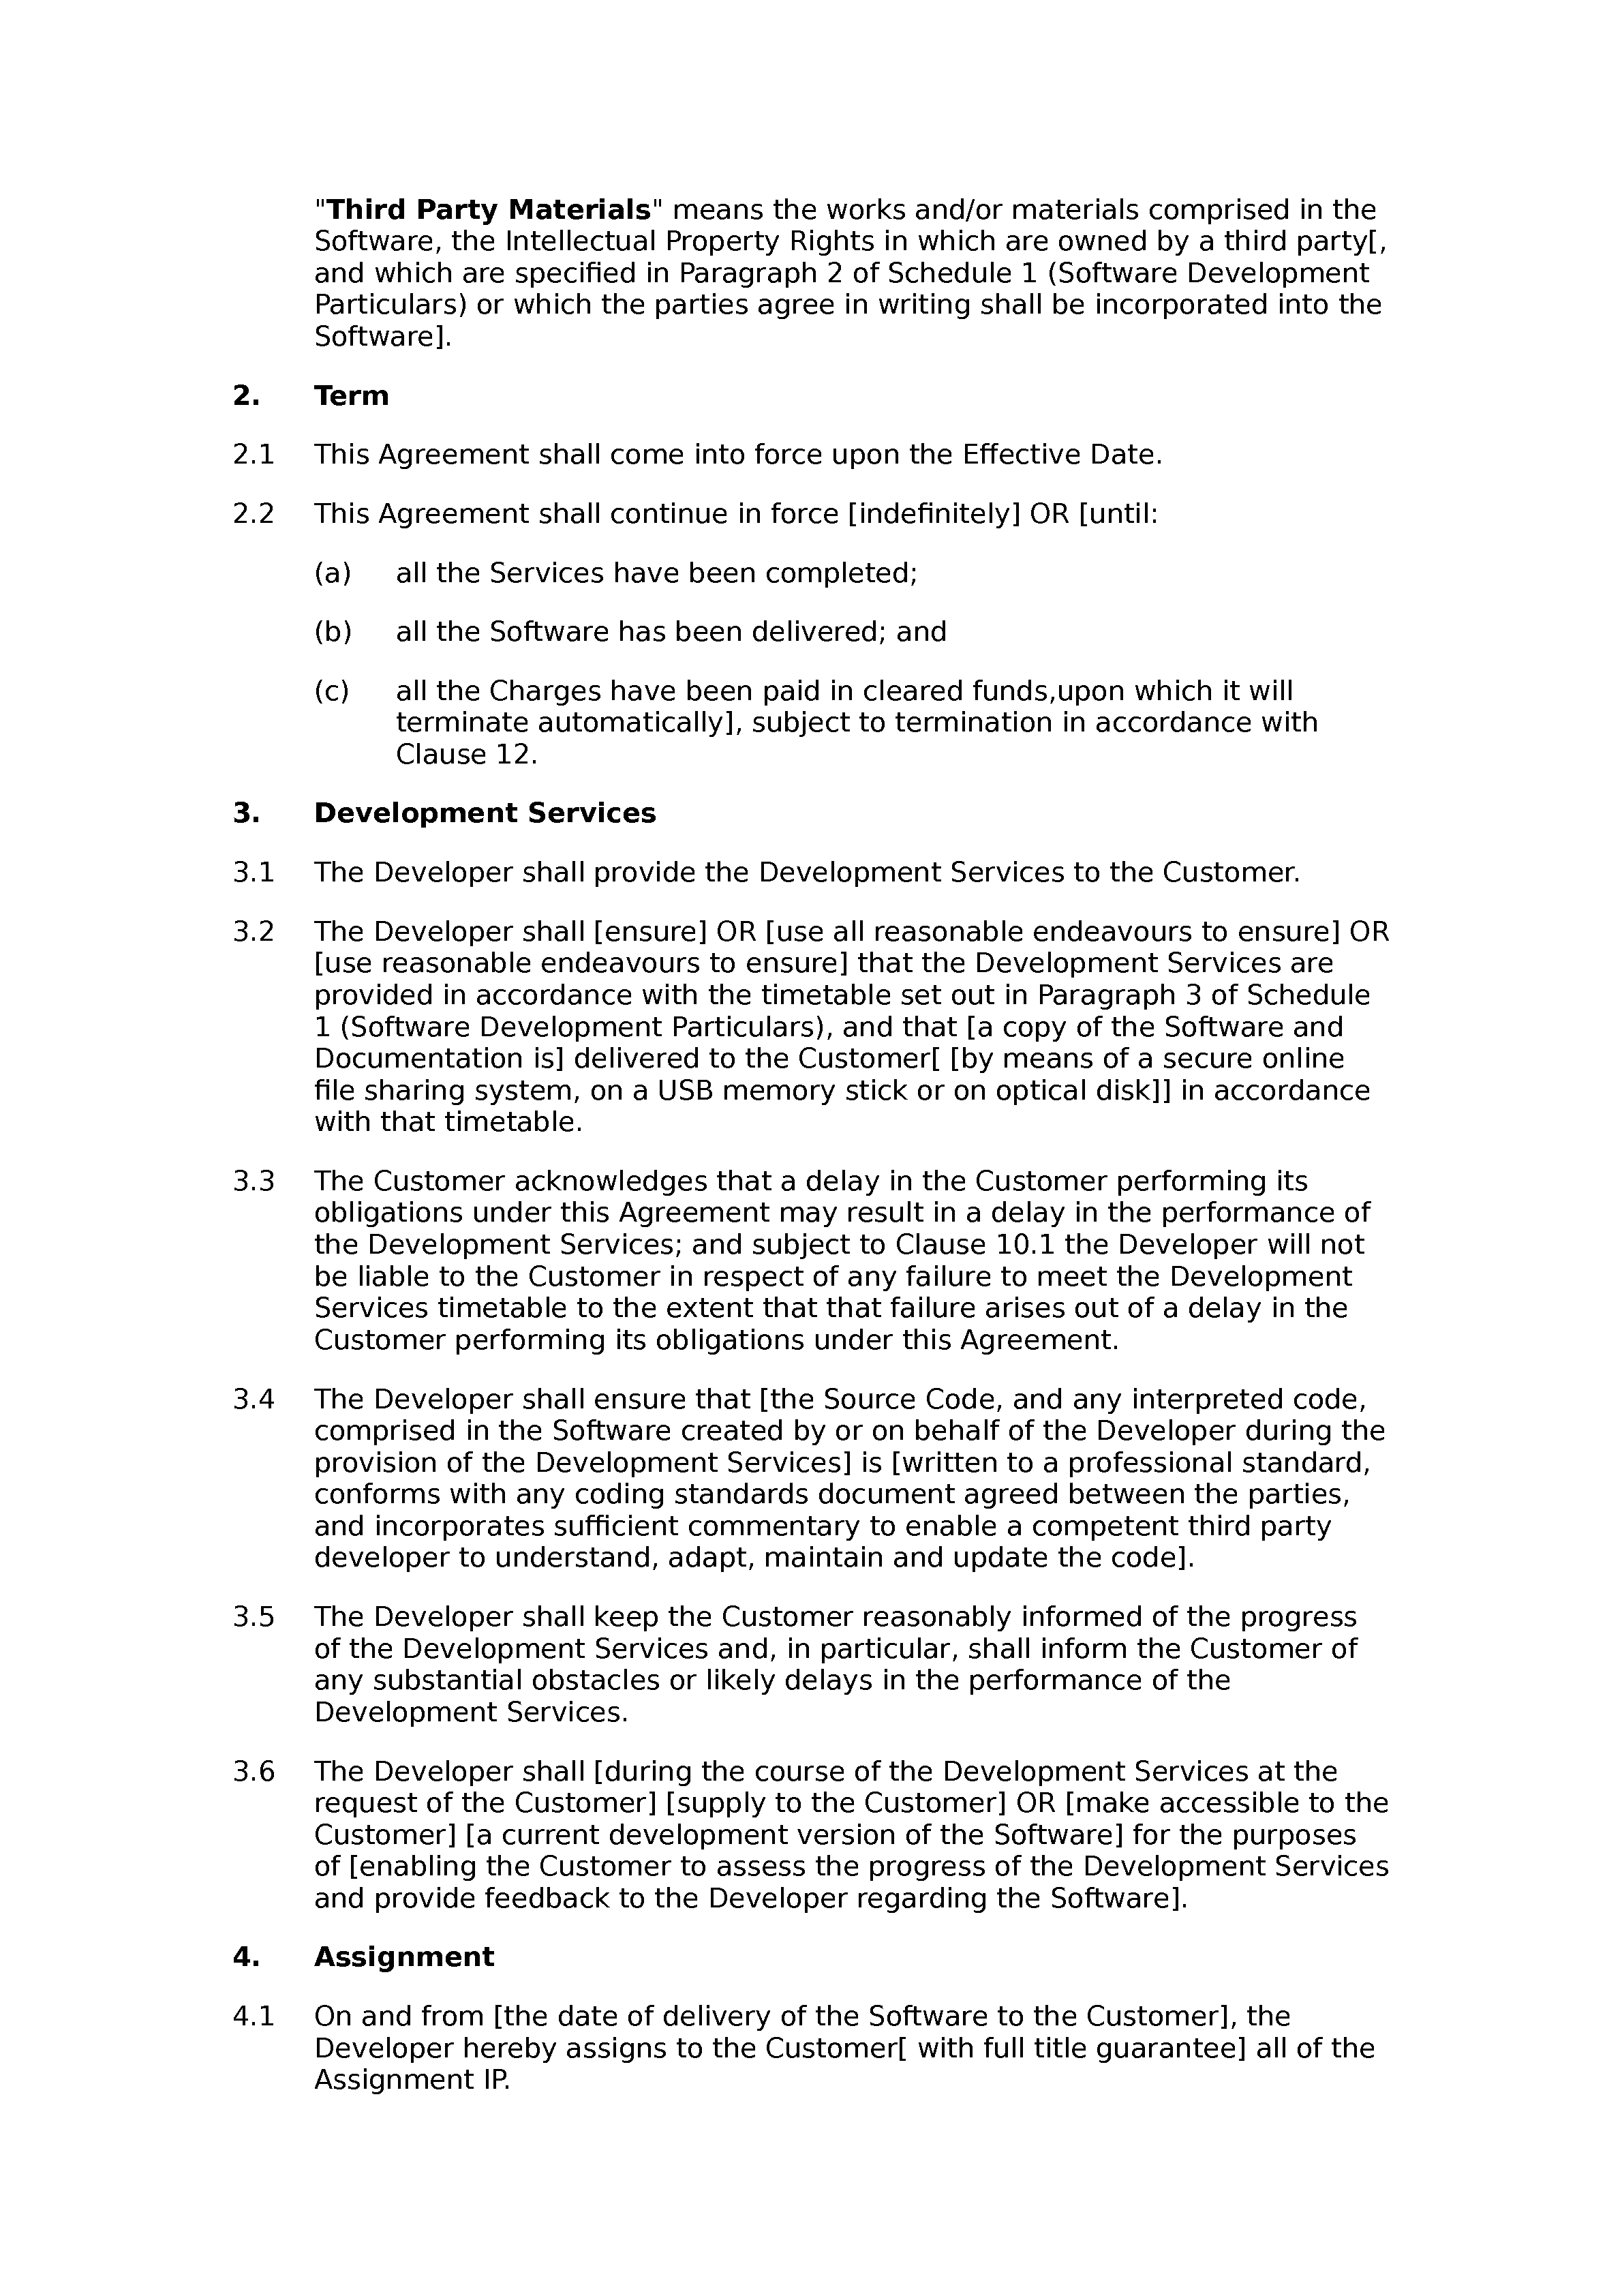 Software development agreement (basic) document preview